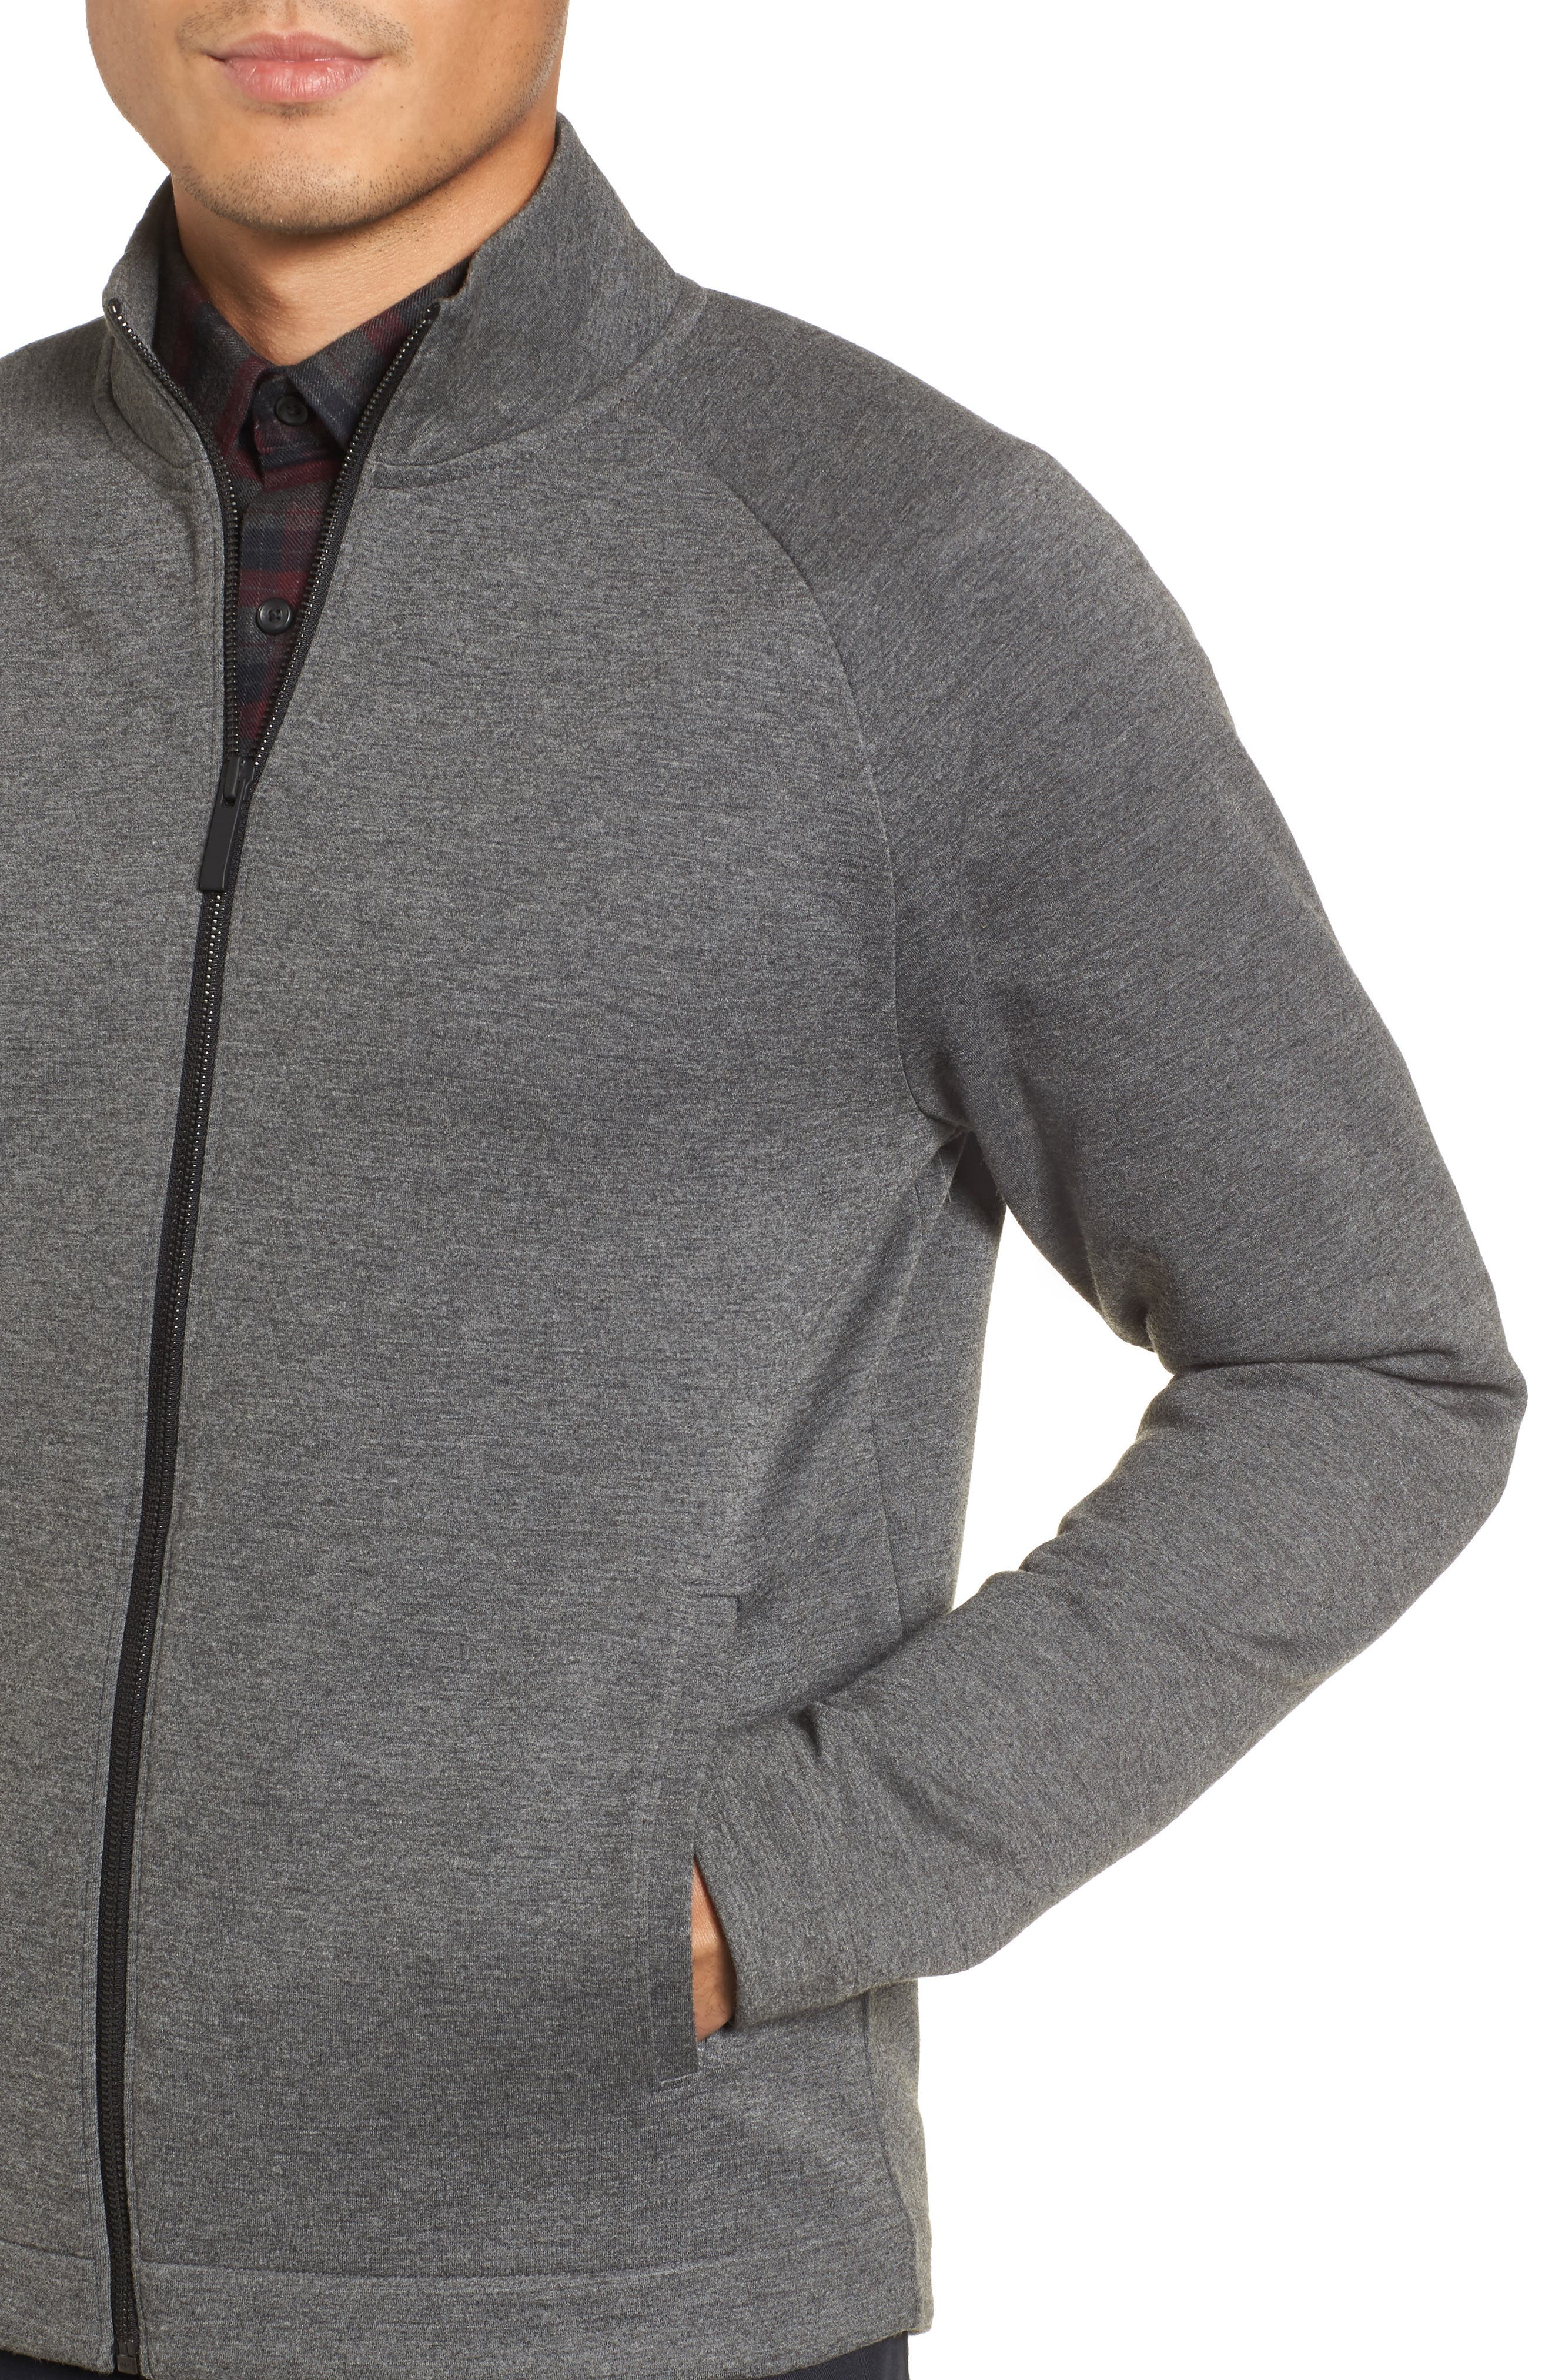 Fleece Jacket,                             Alternate thumbnail 4, color,                             Grey Magnet Heather